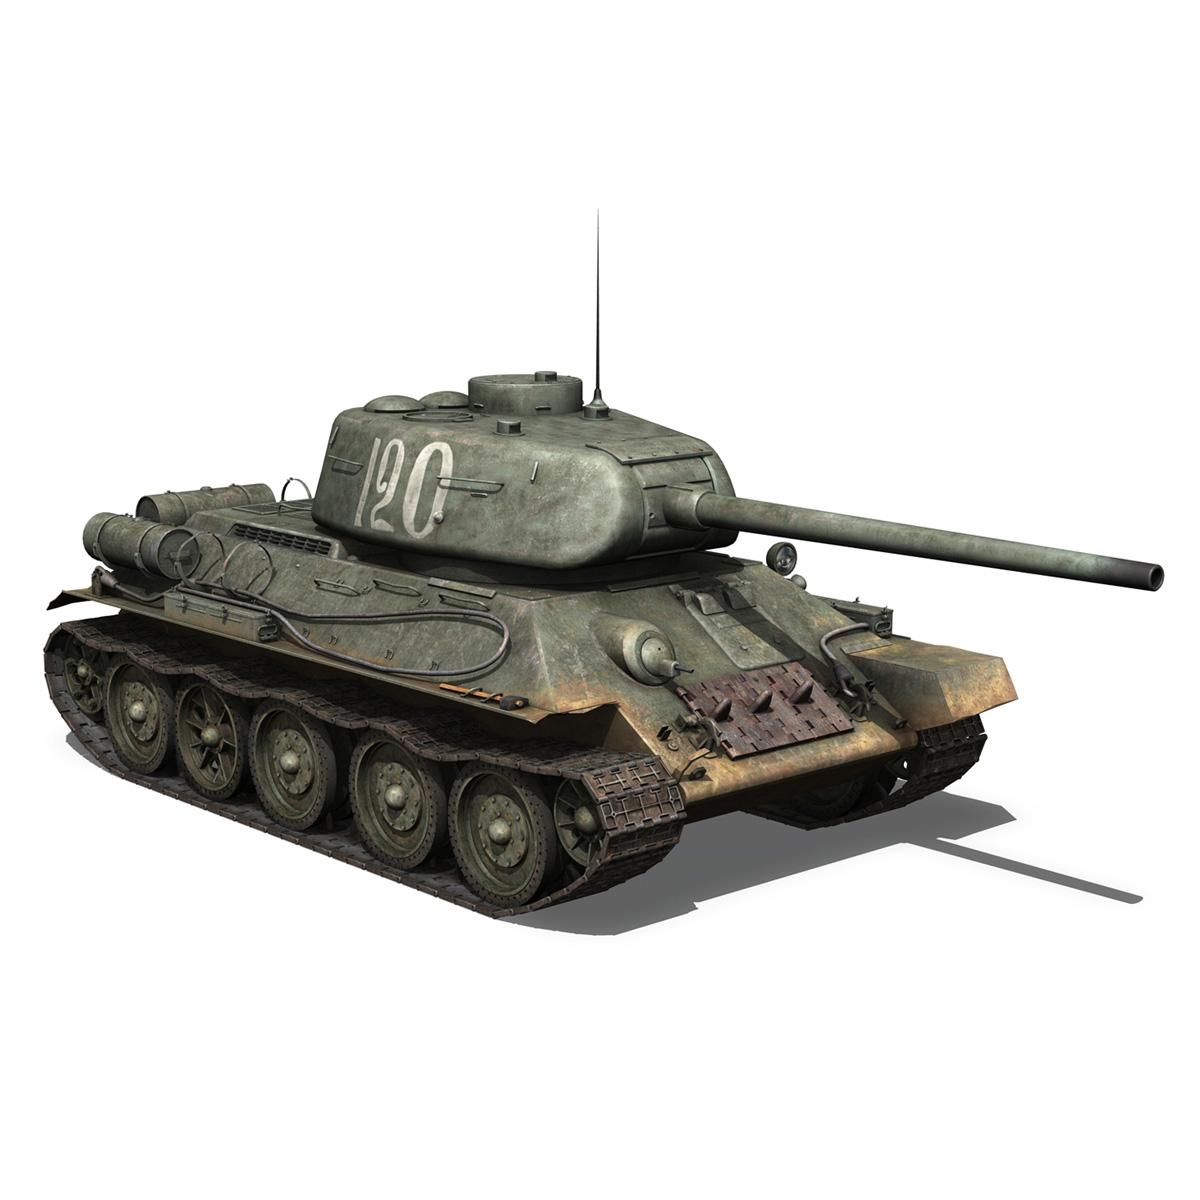 t-34 85 – soviet medium tank – 120 3d model 3ds fbx lwo lw lws obj c4d 265375